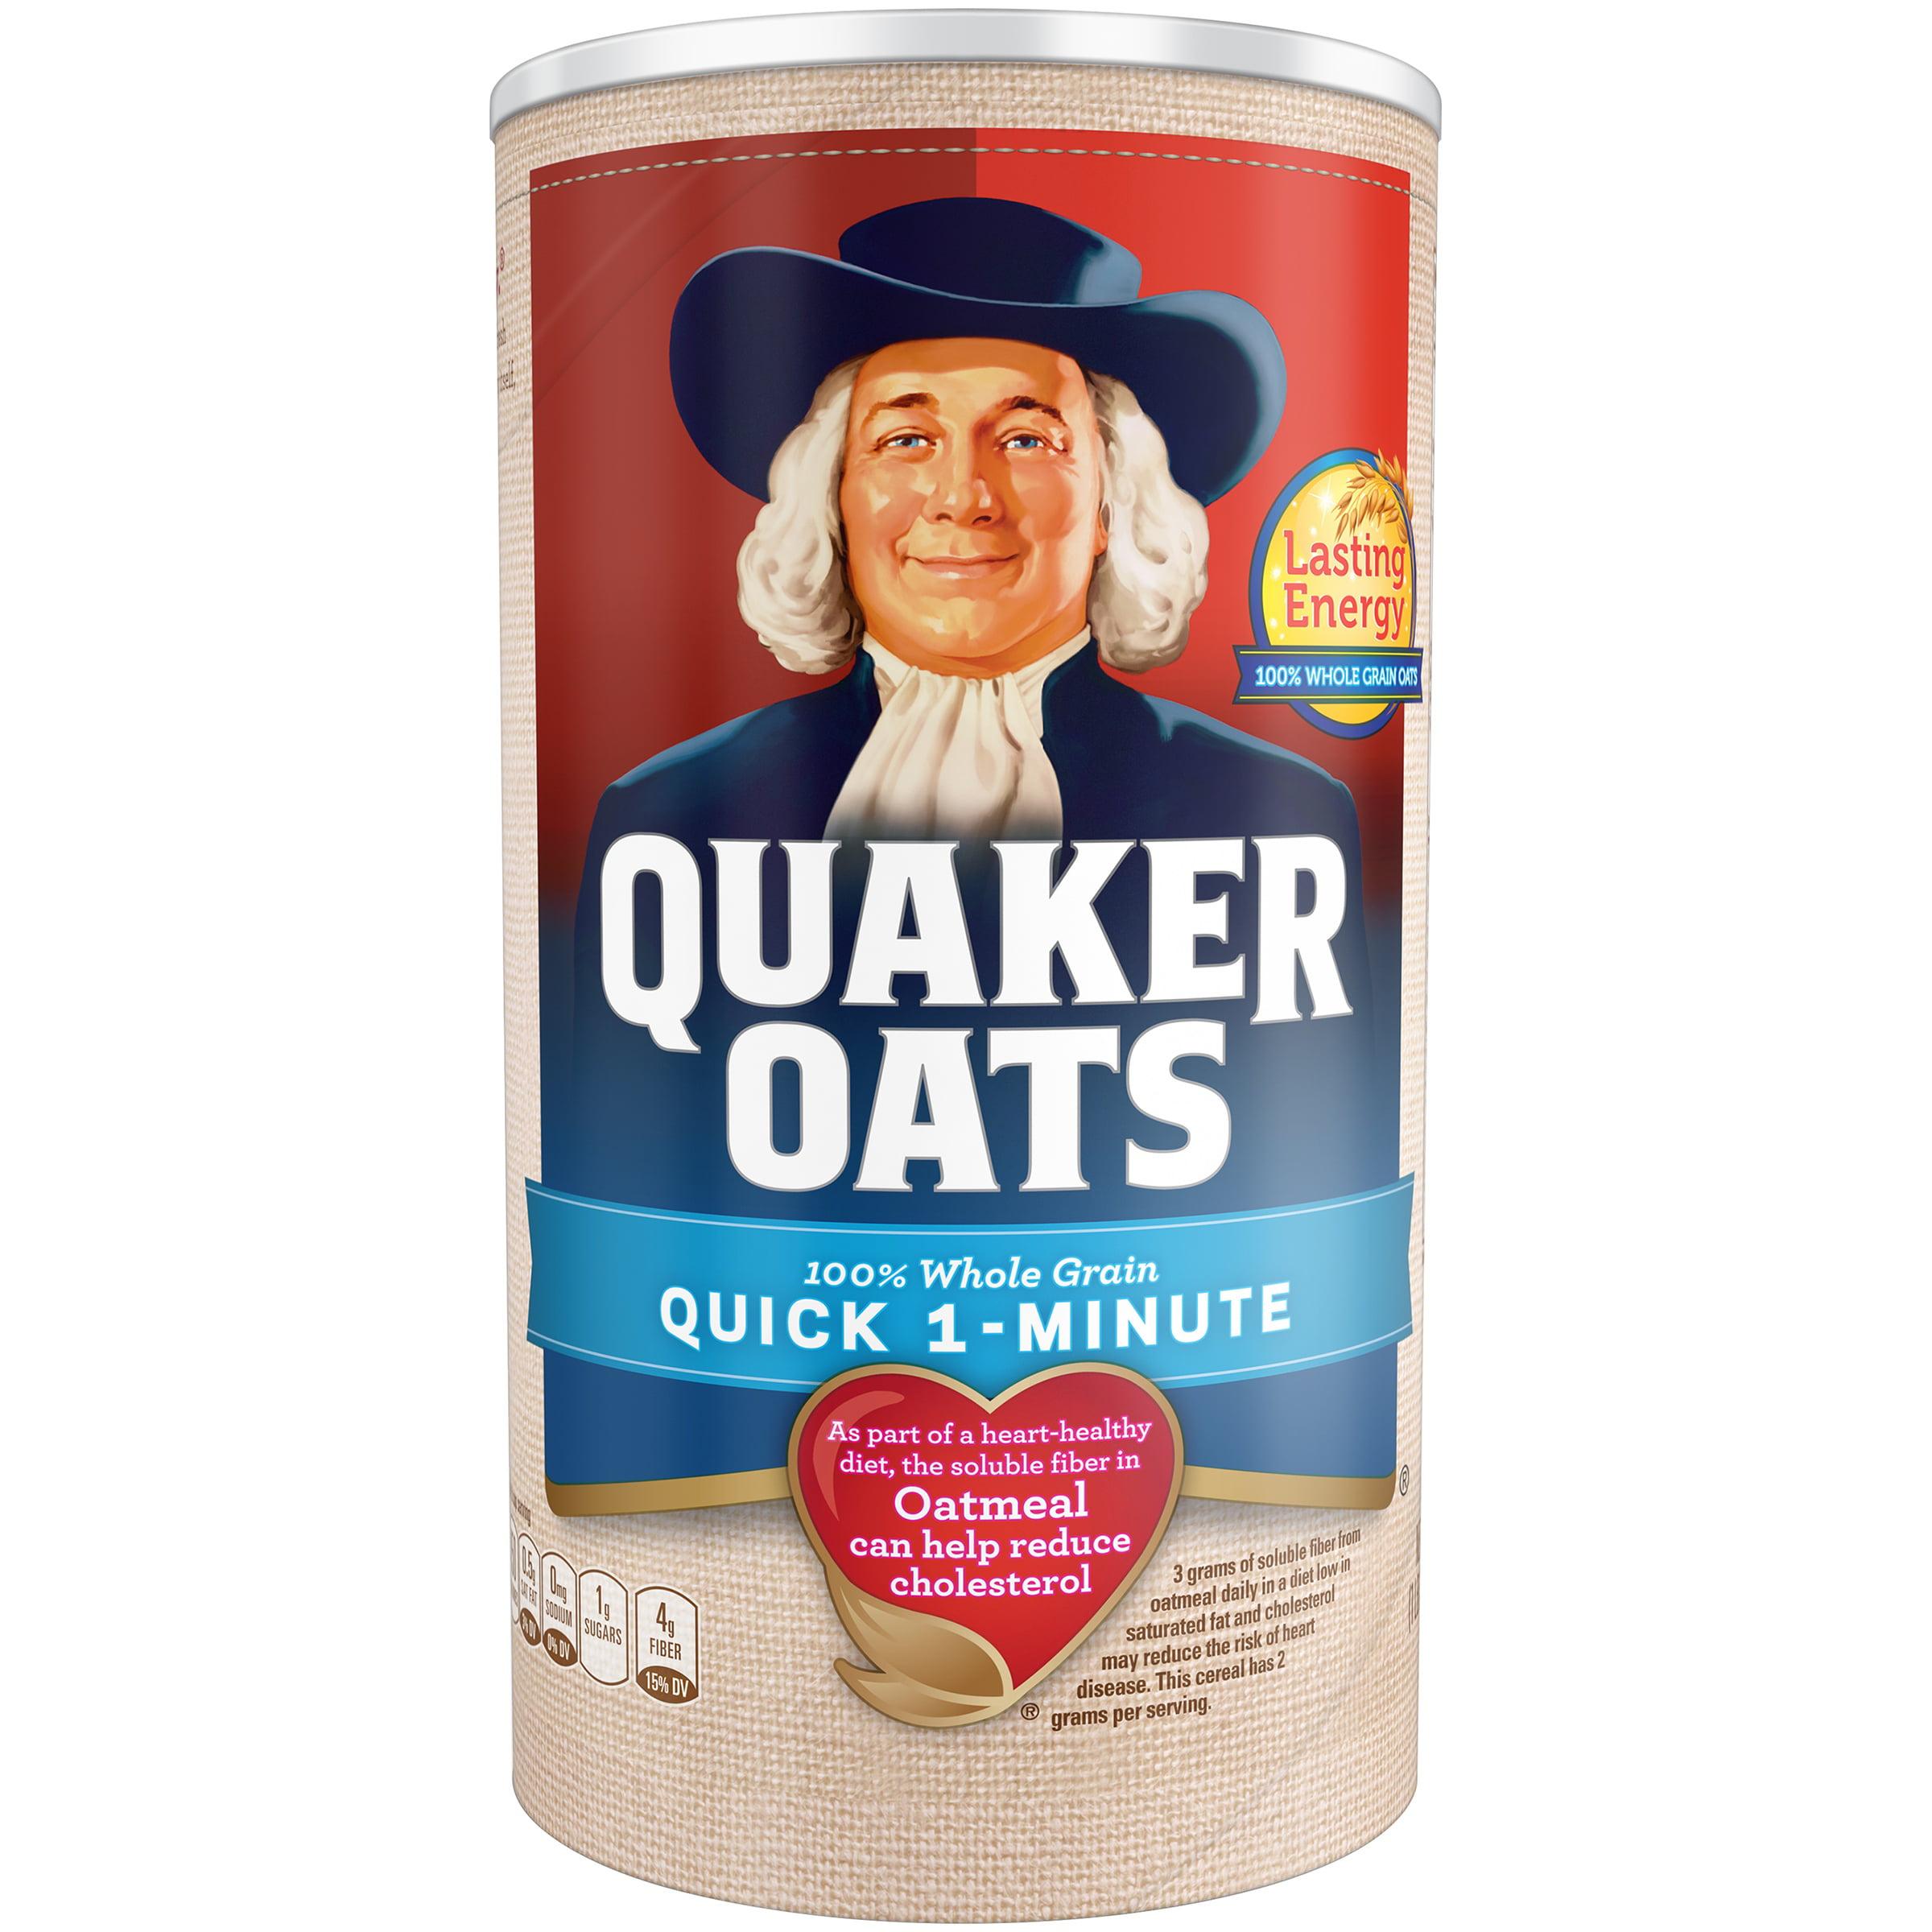 Quaker Oats, Quick 1 - Minute Oatmeal, 18 oz Canister